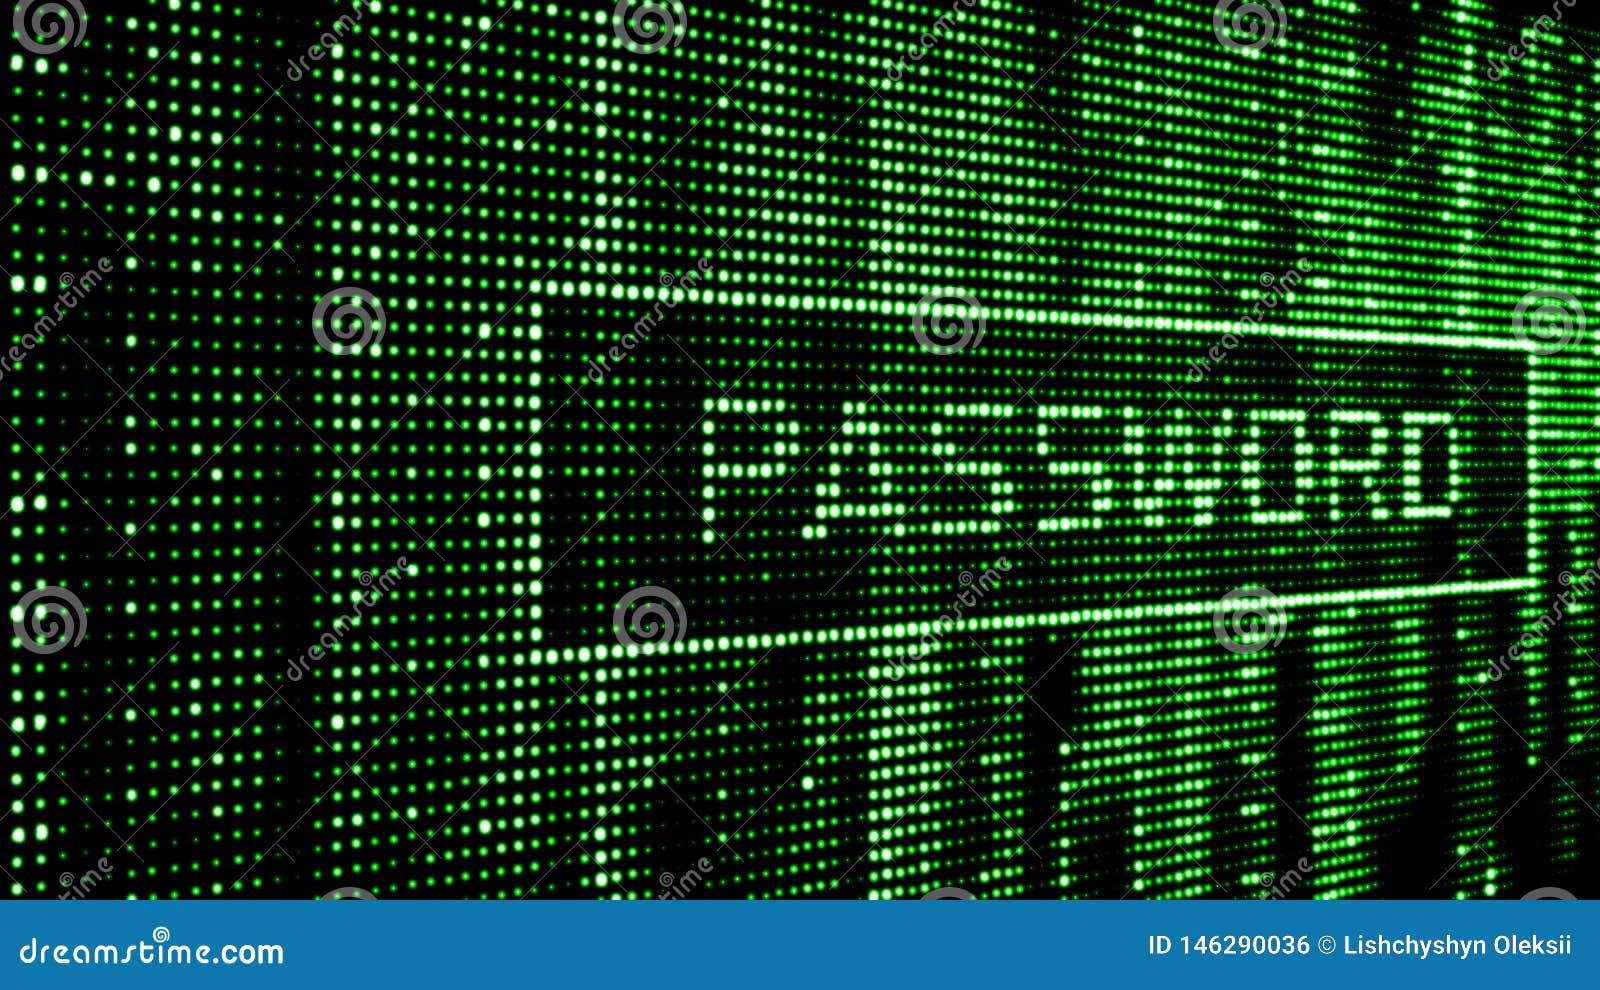 Fixez le mot de passe Attaque de Cyber tailler Matrice verte de fond de Digital Code machine binaire rendu 3d